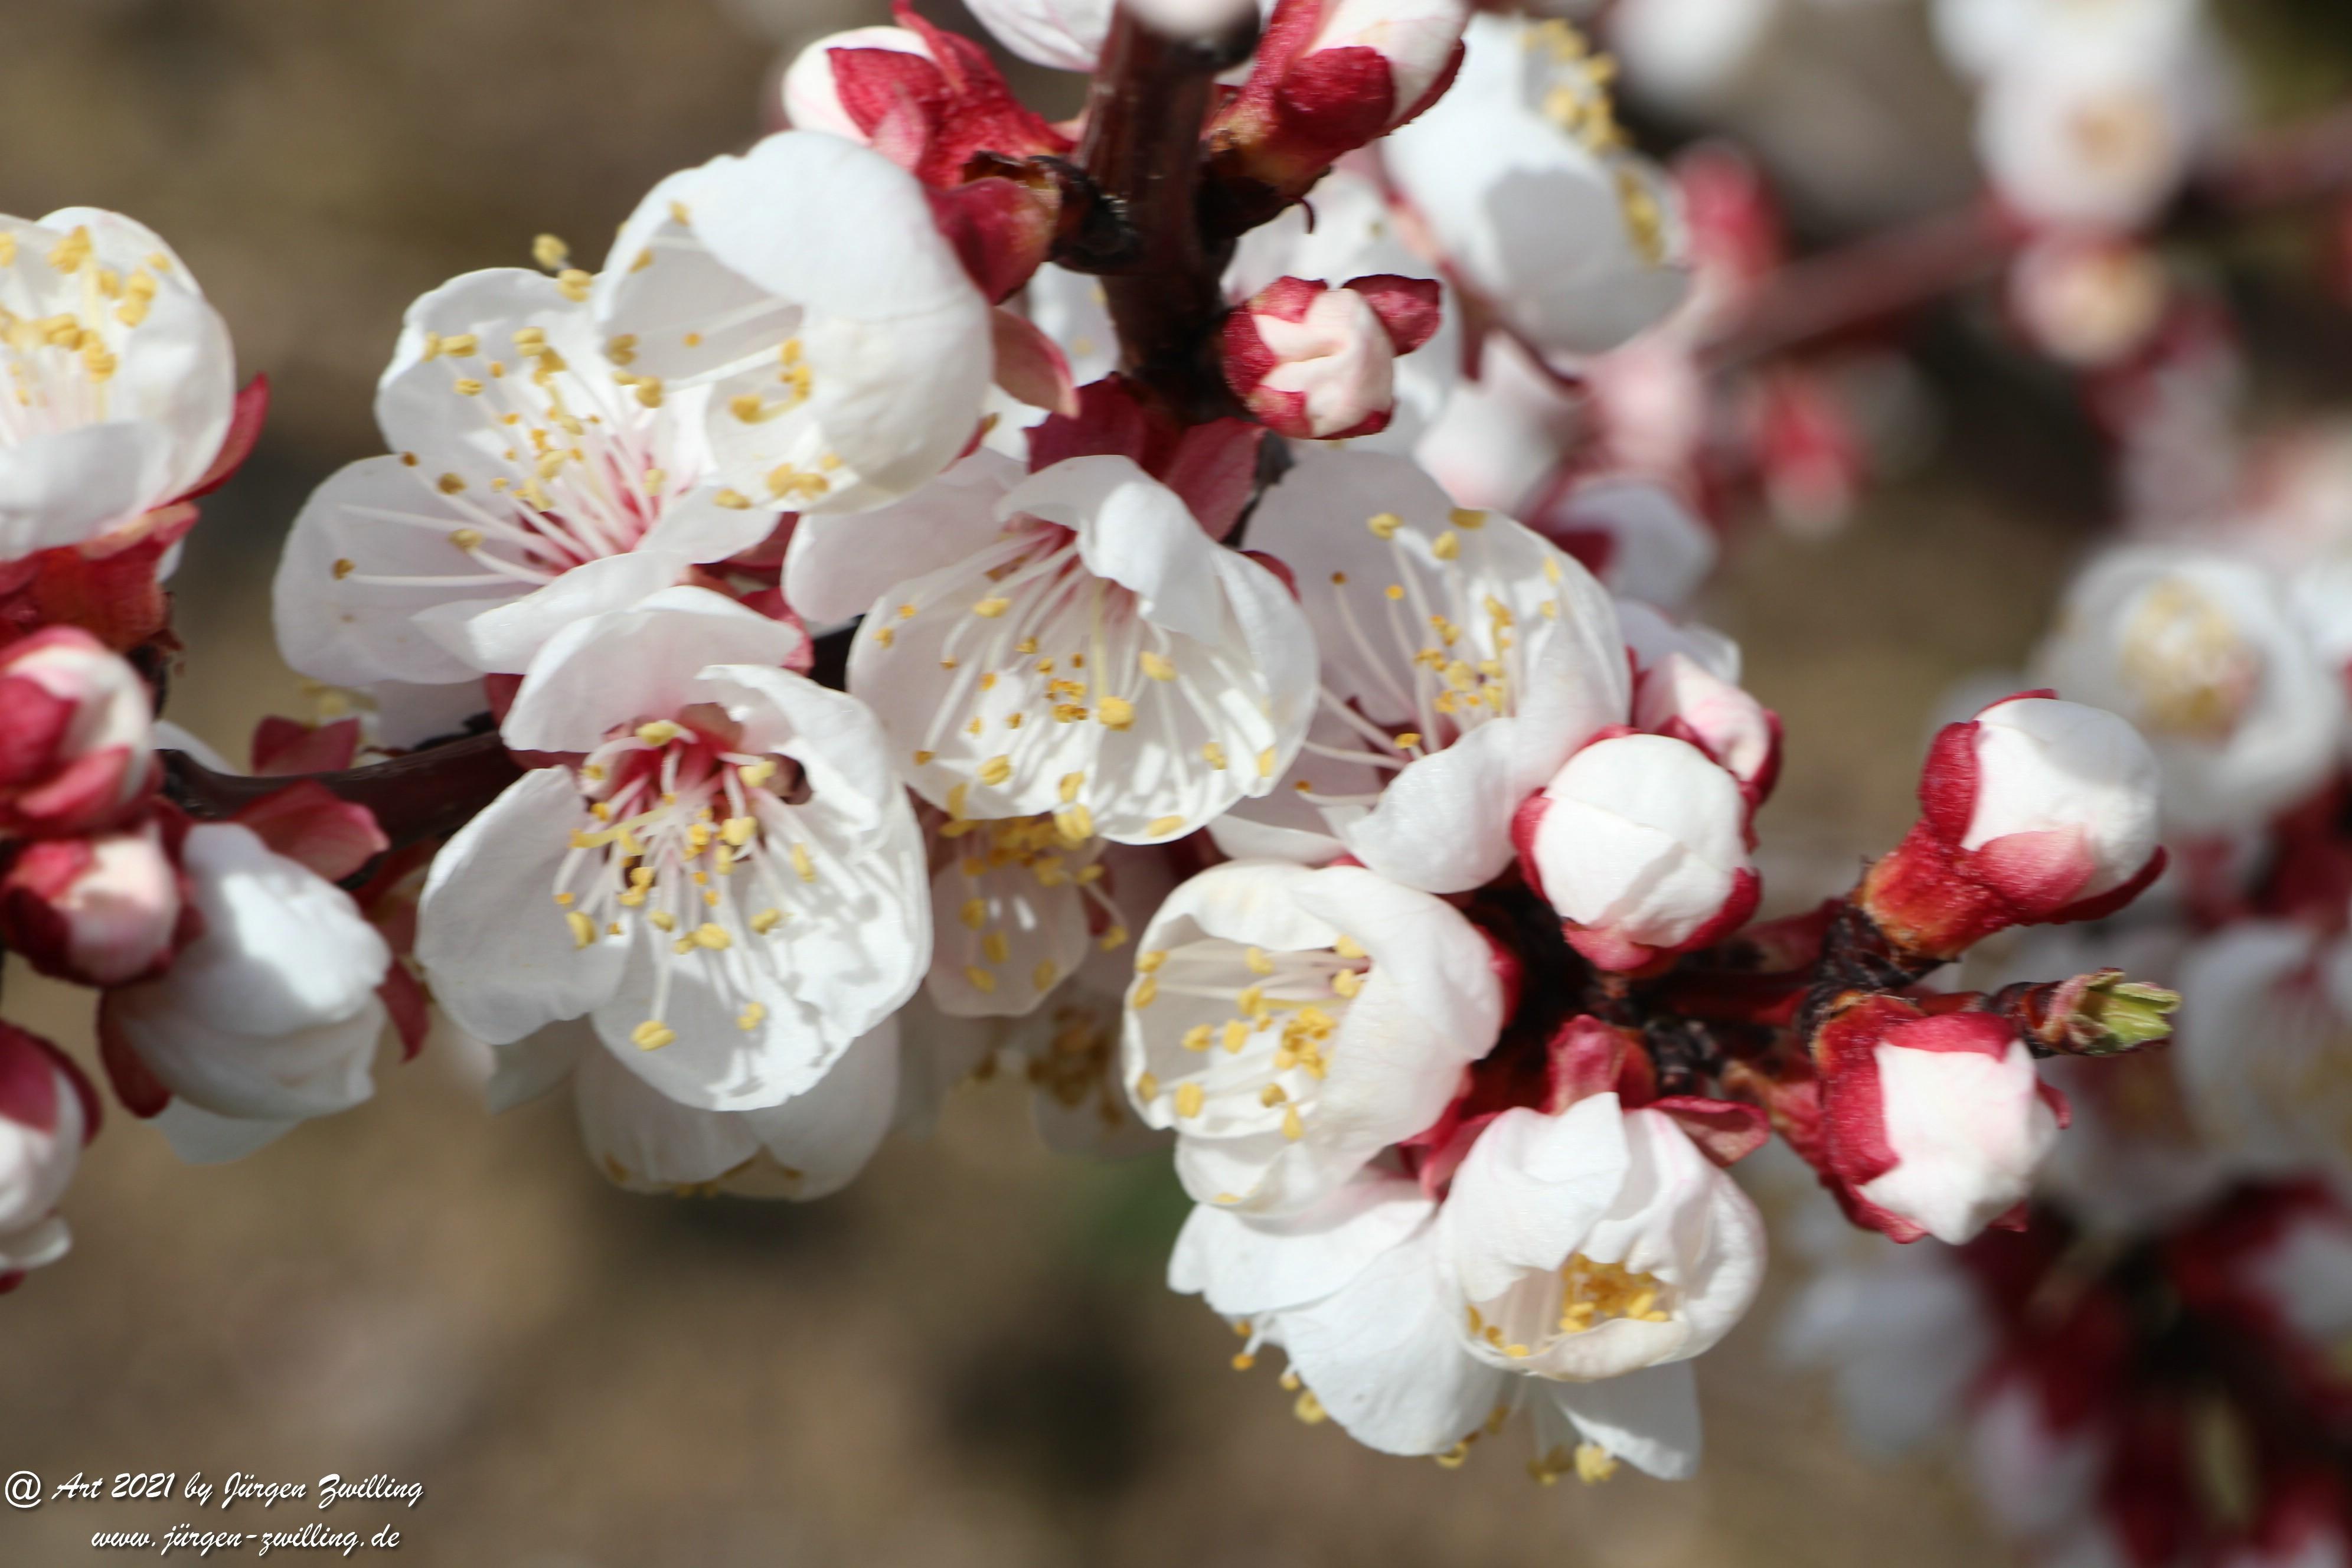 Aprikosenblüte 24